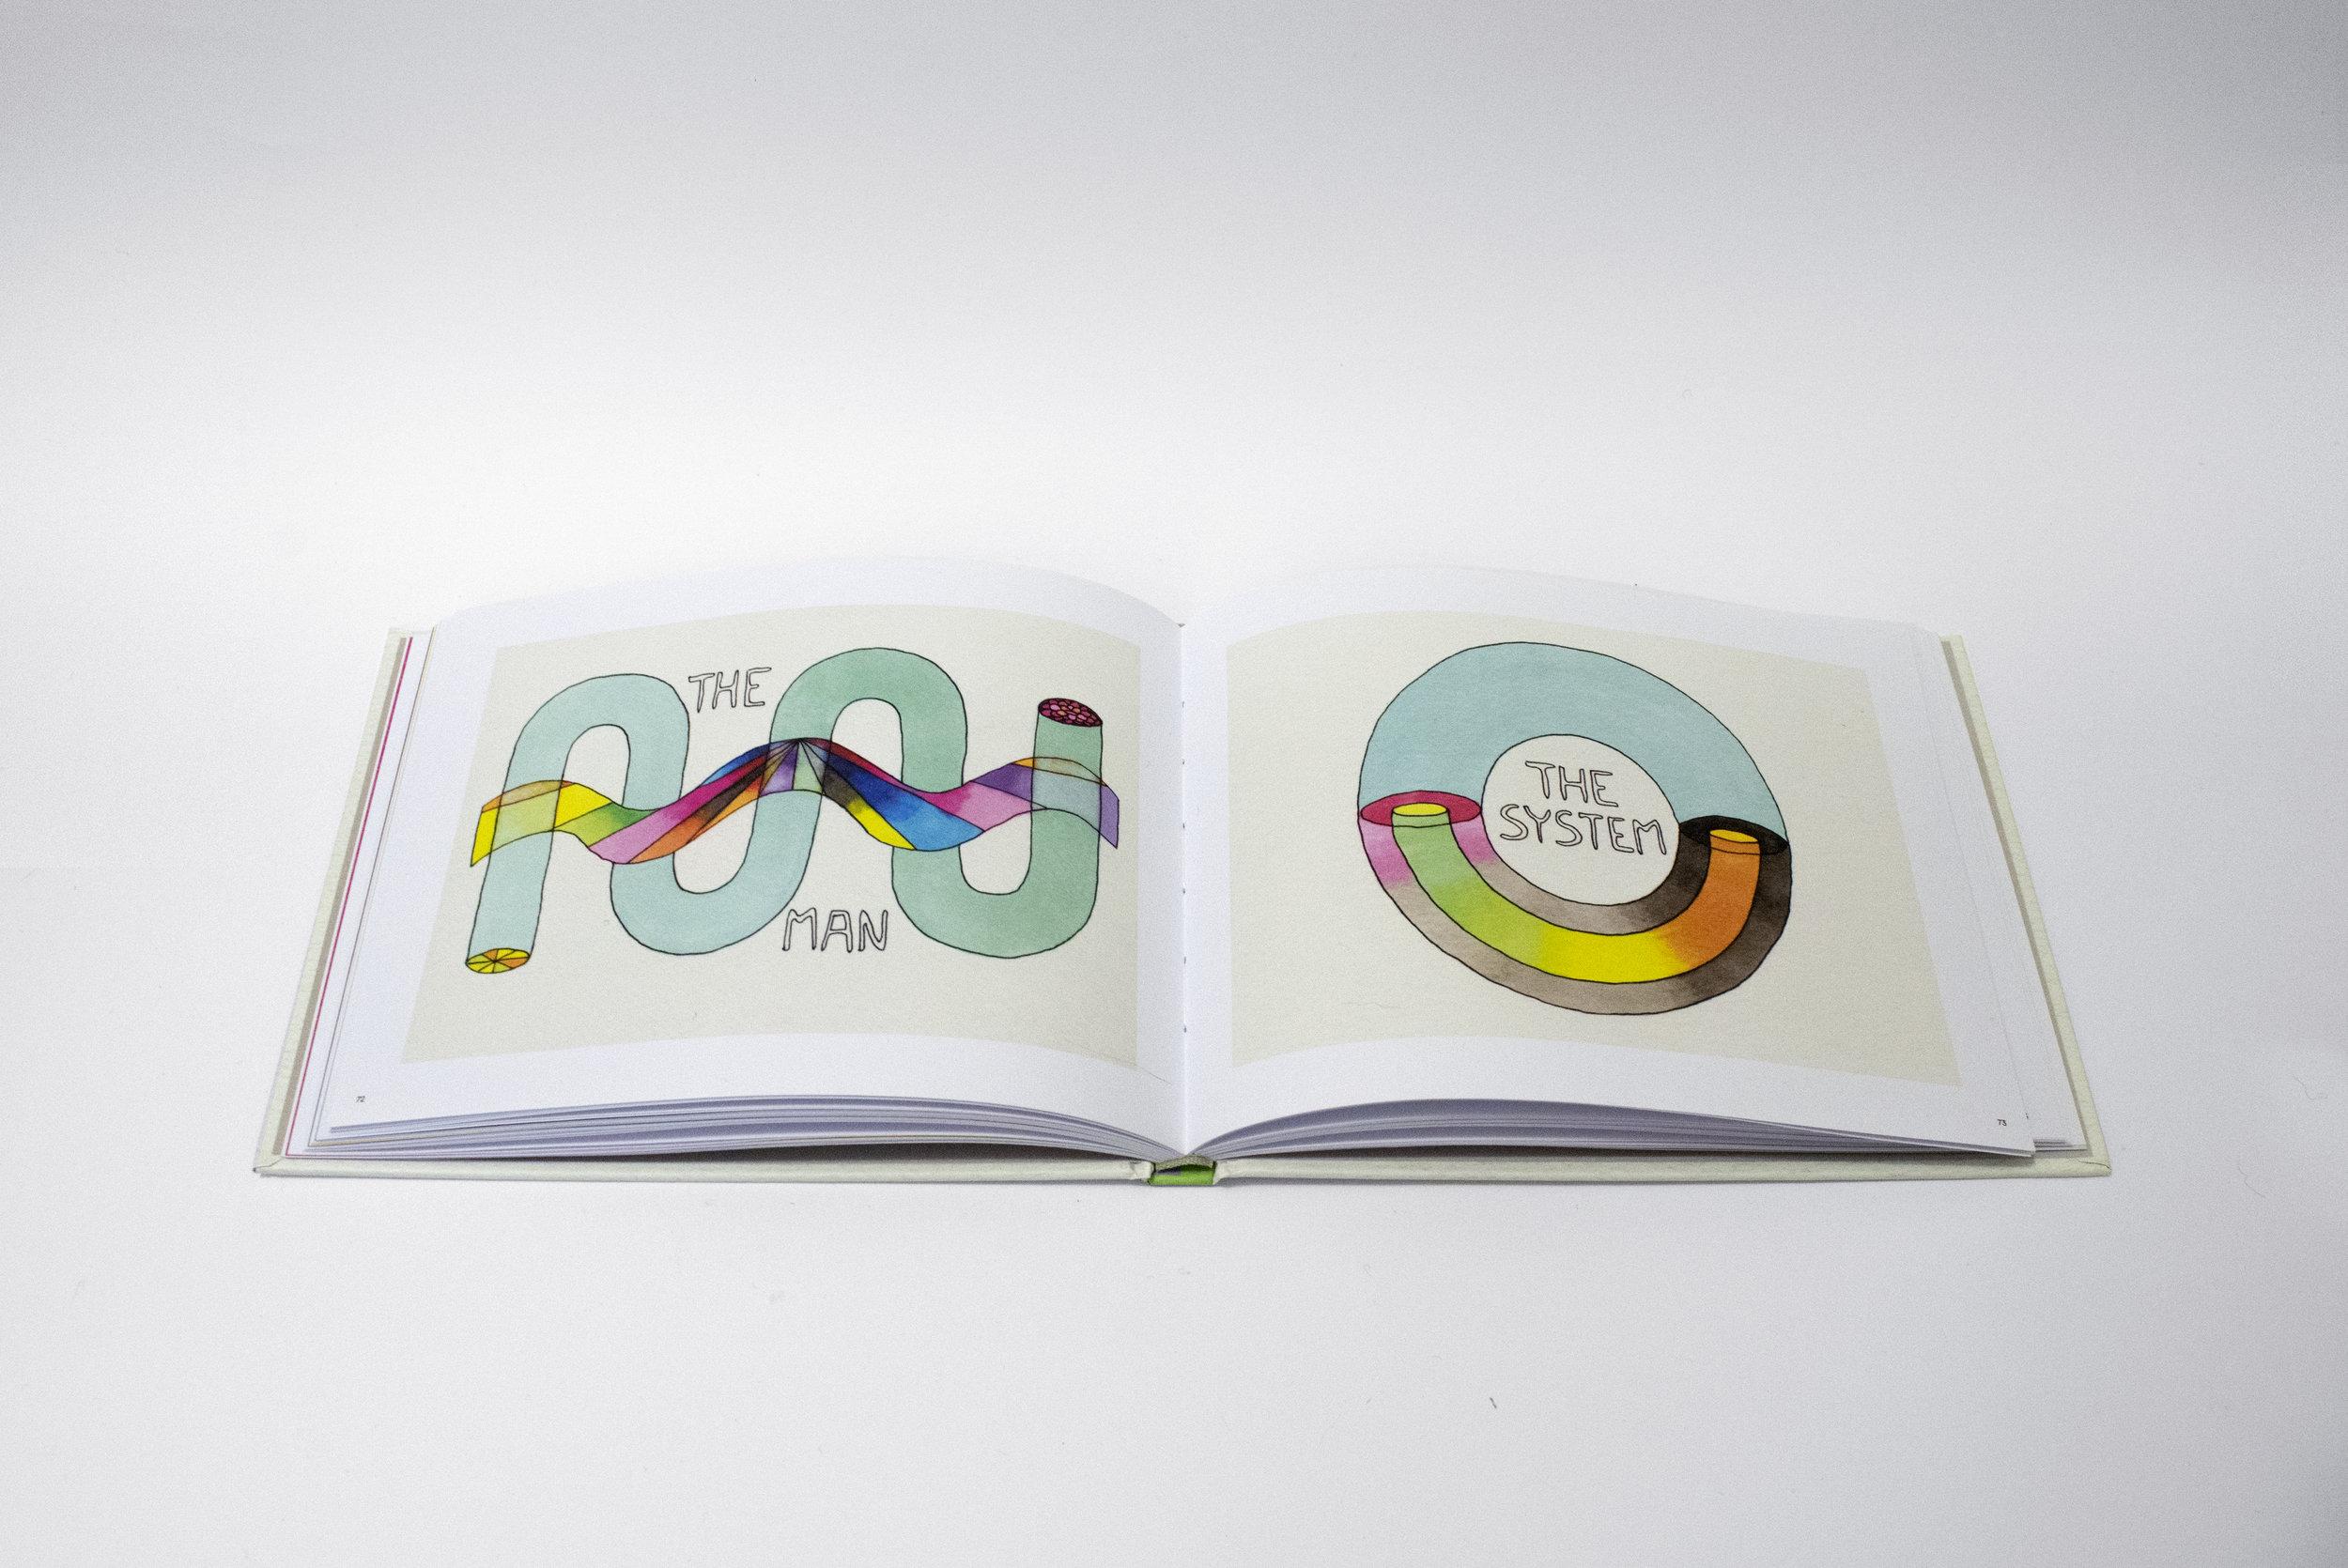 happe-book-interior-1.jpg